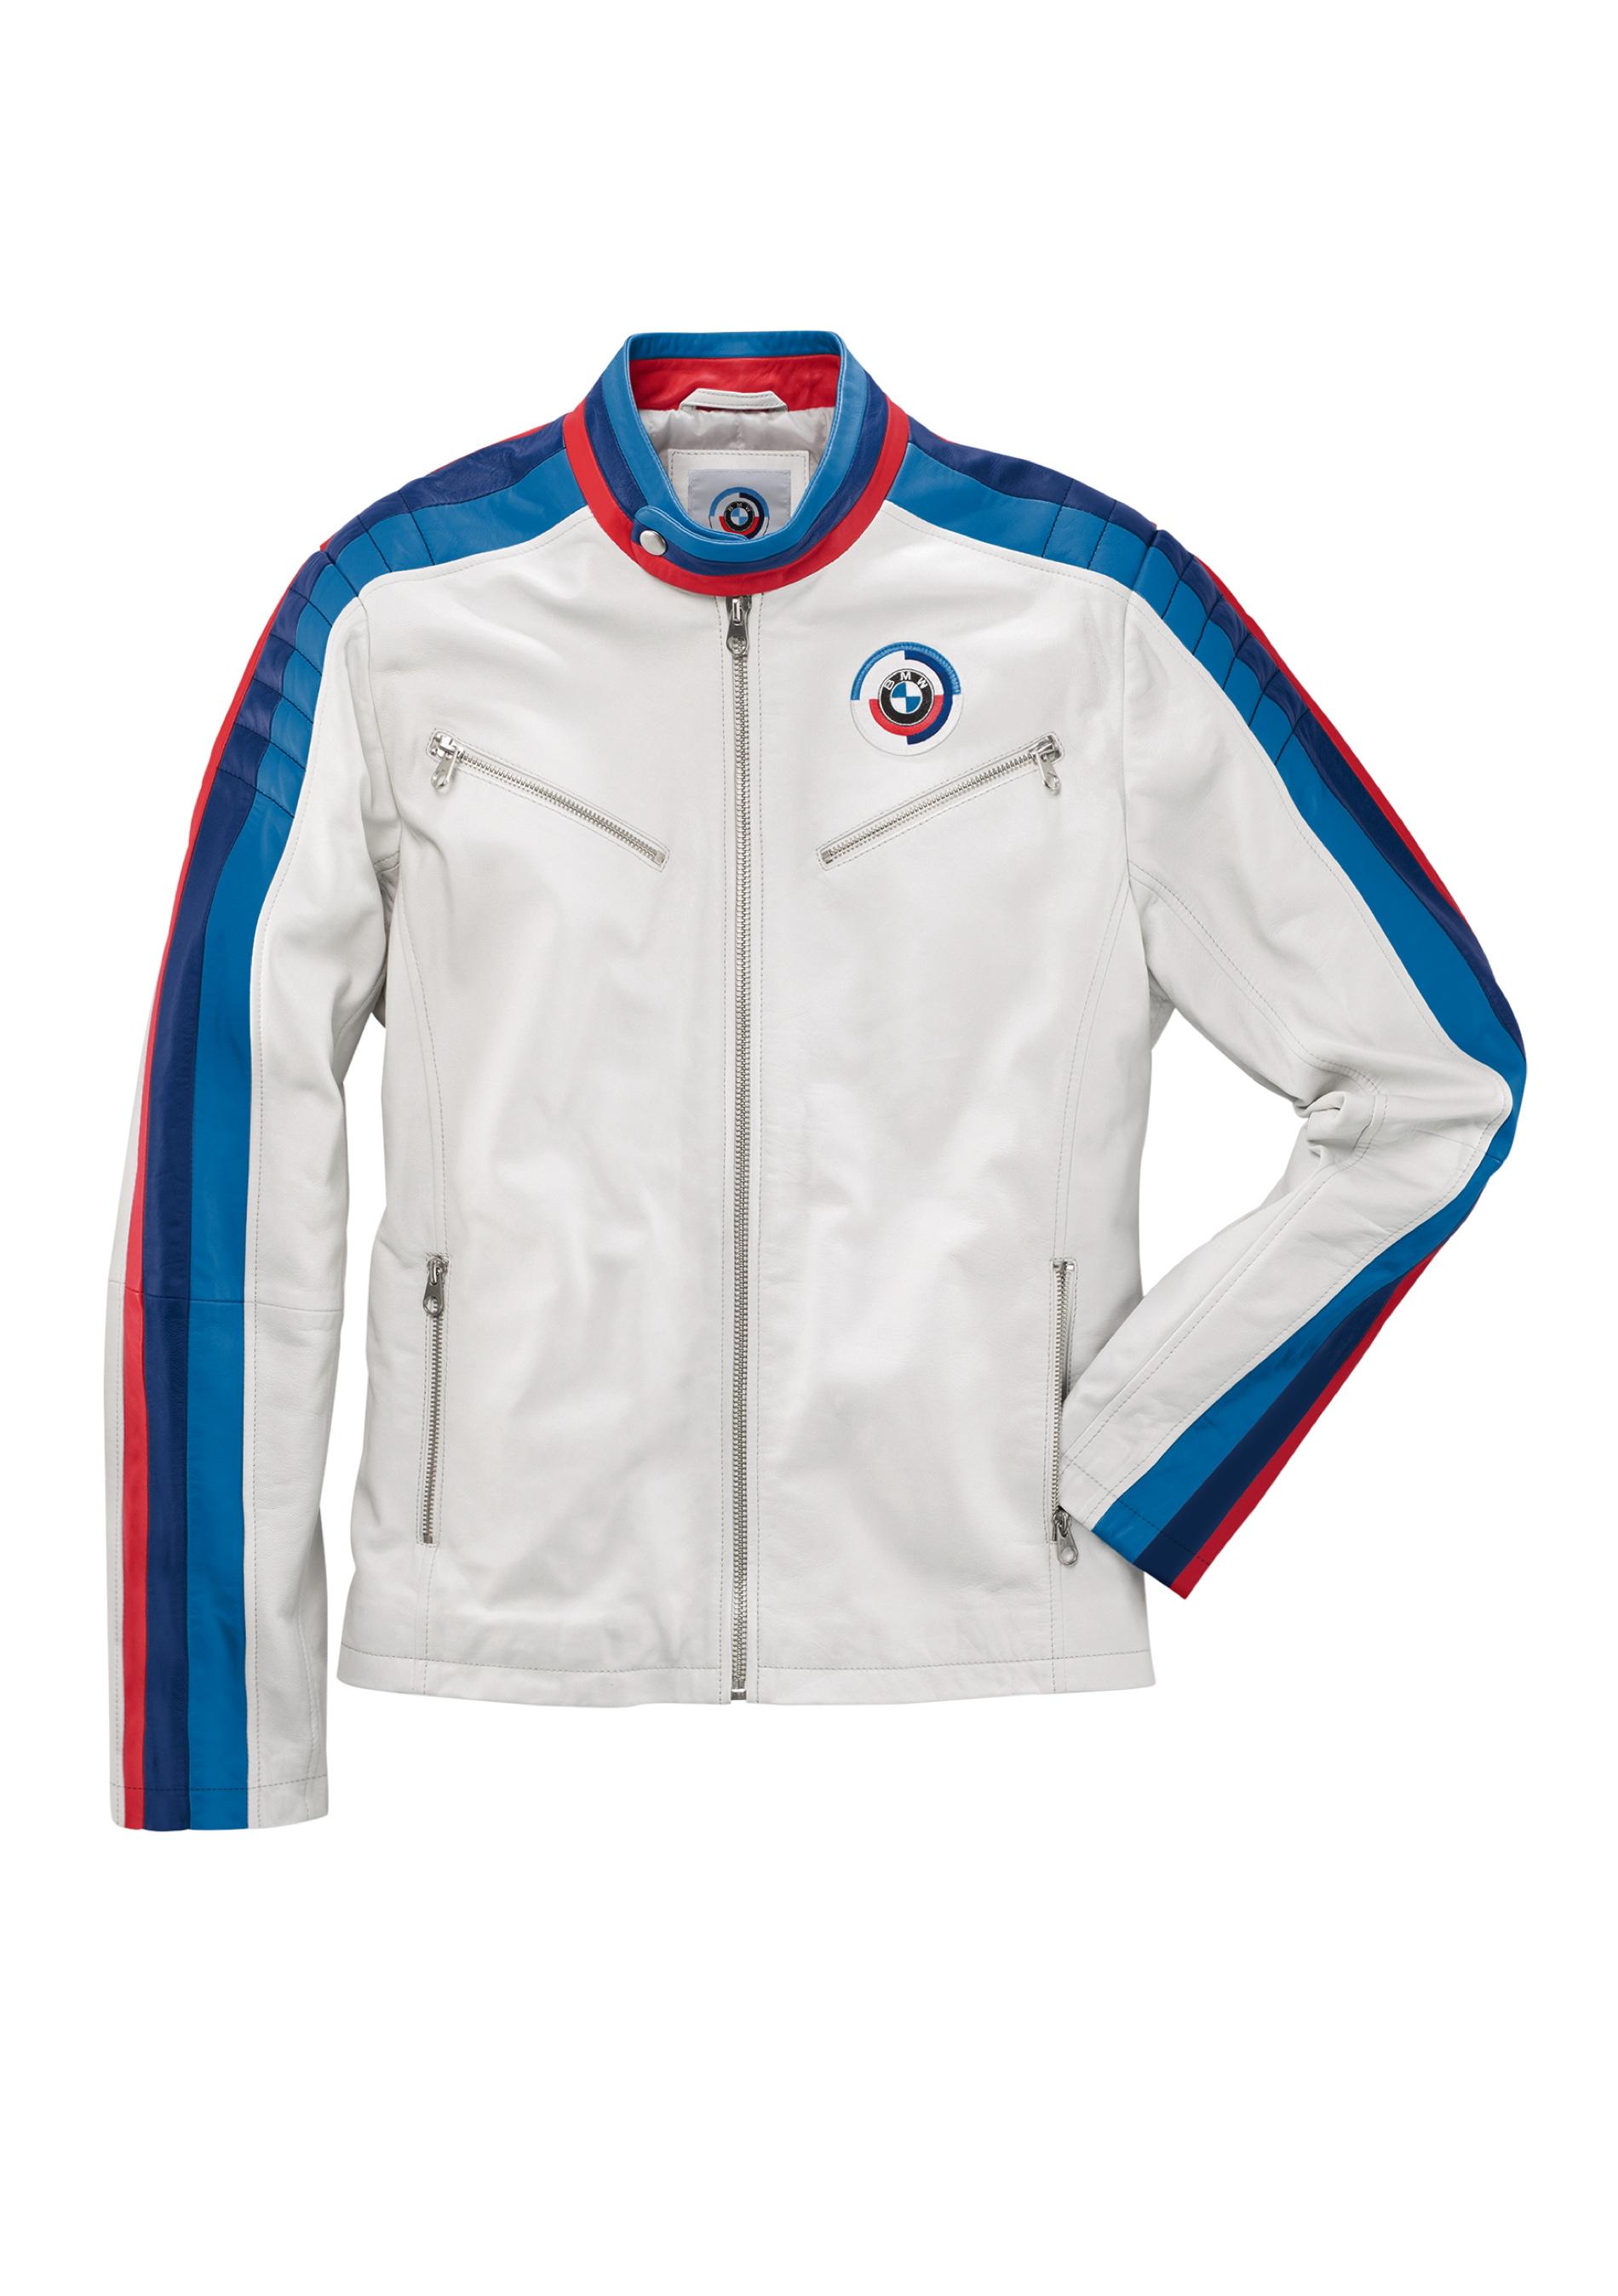 sleeve shirt of s shop long eat t mens sleep motorholics bmw clothing variation coupe